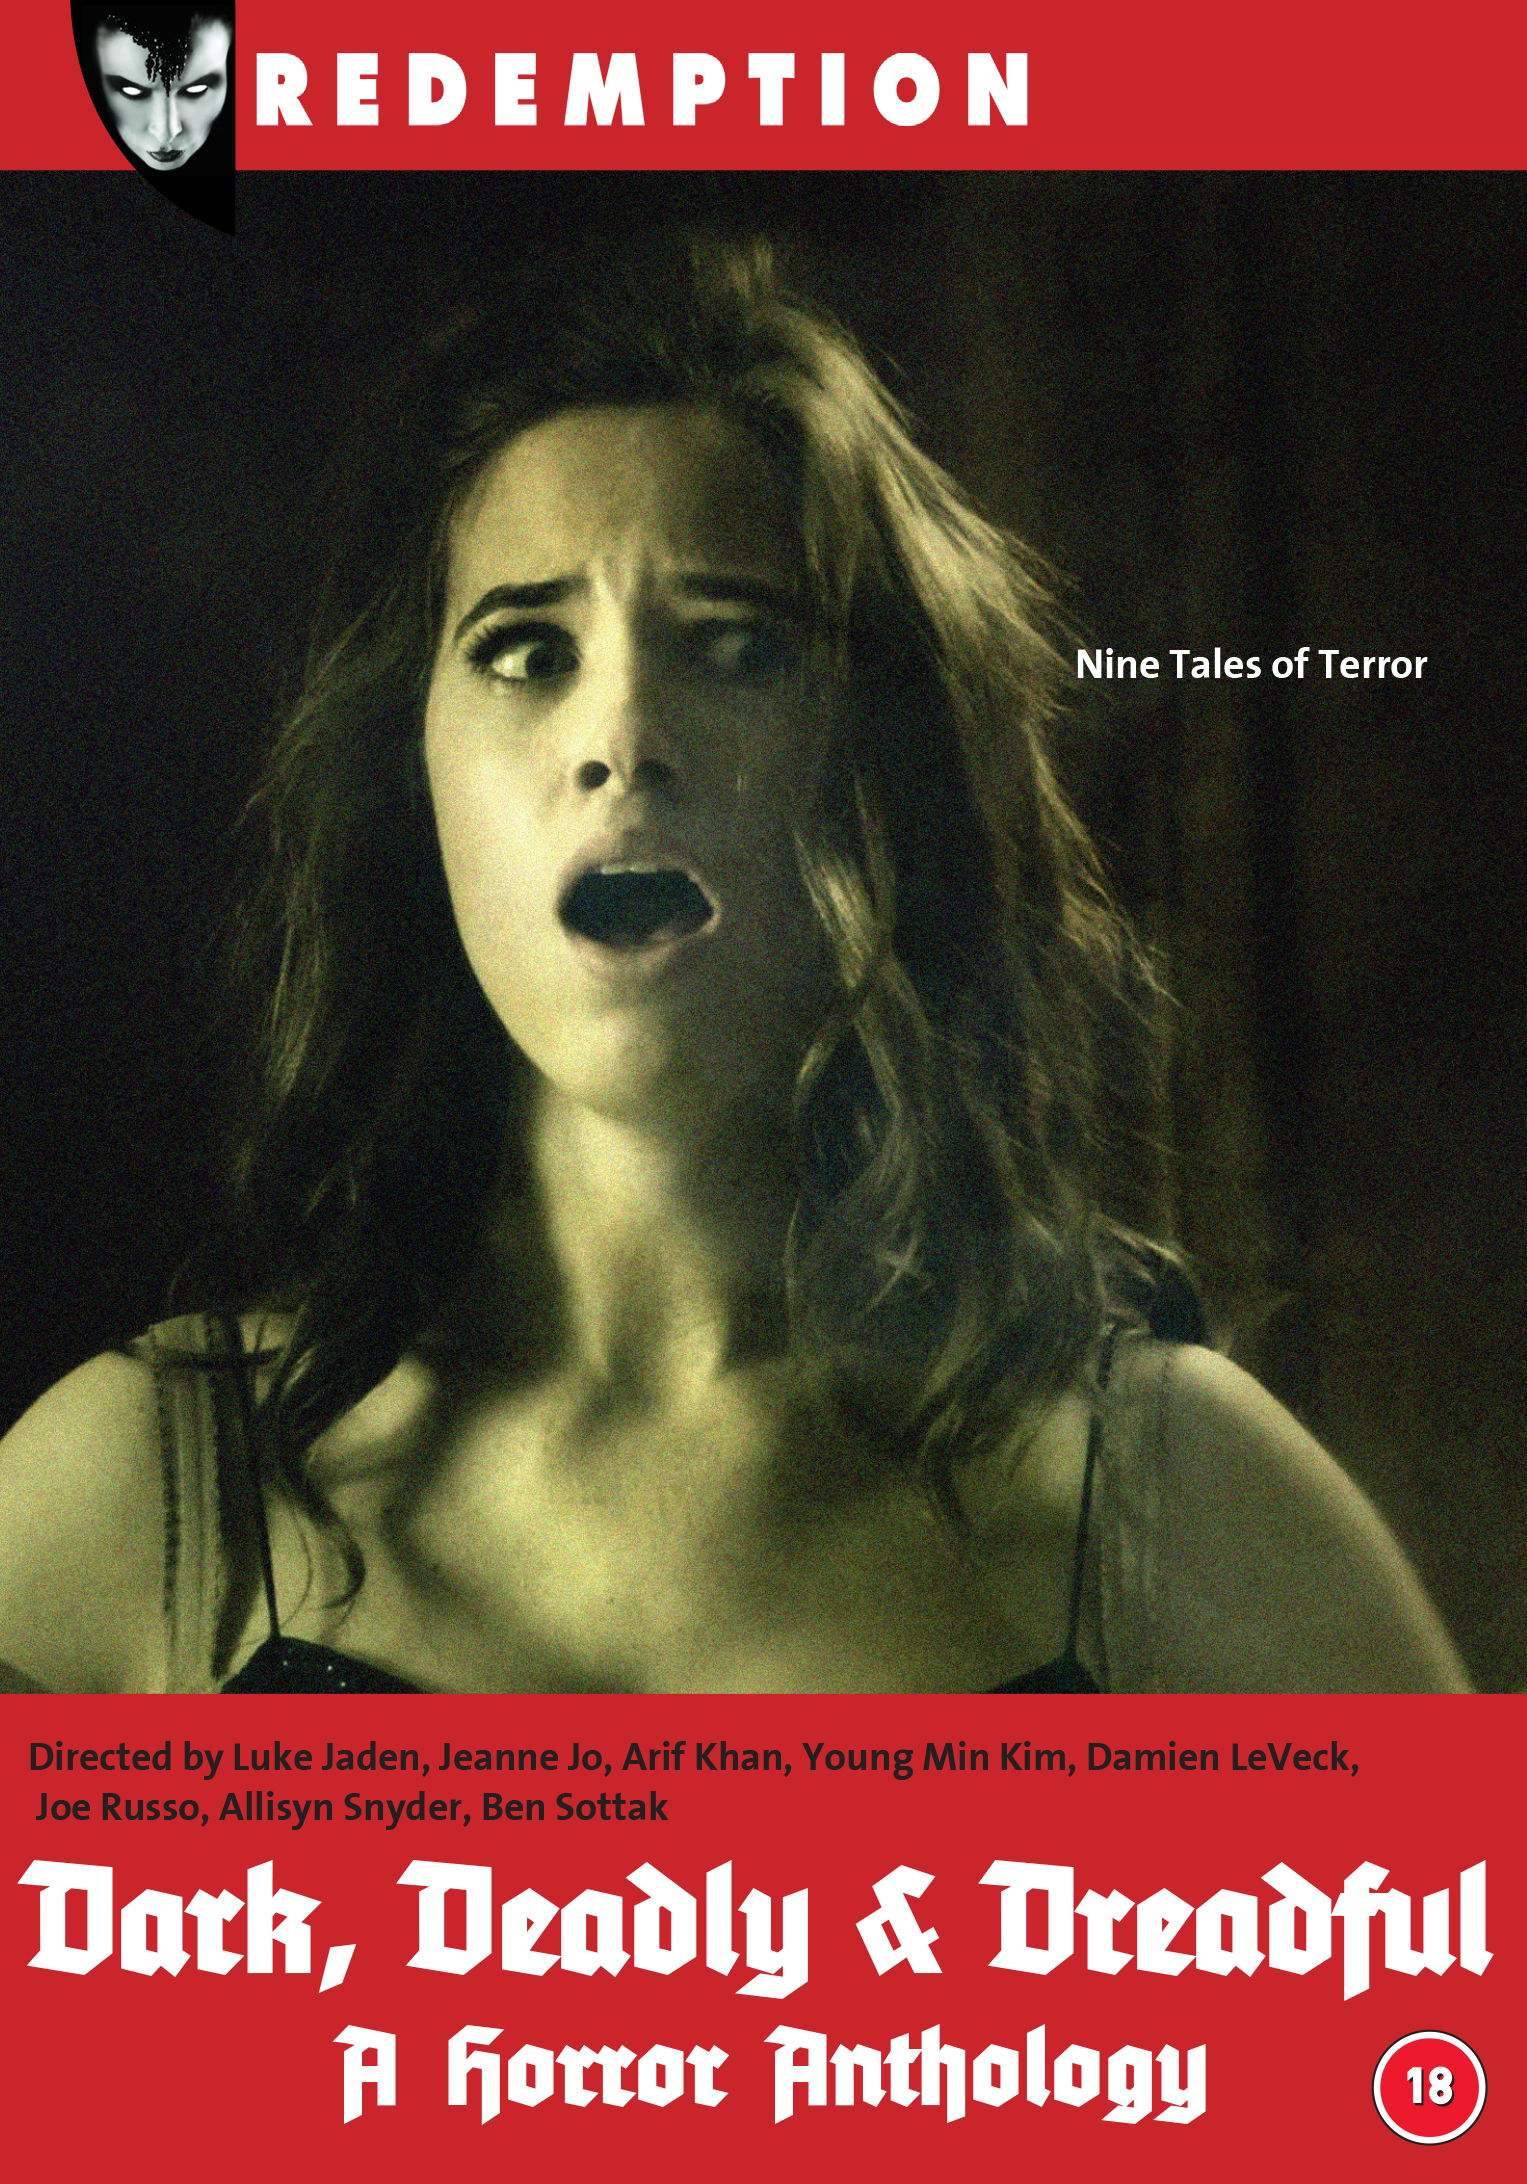 9 short horror fillms, each tackling a different sub genre of horror